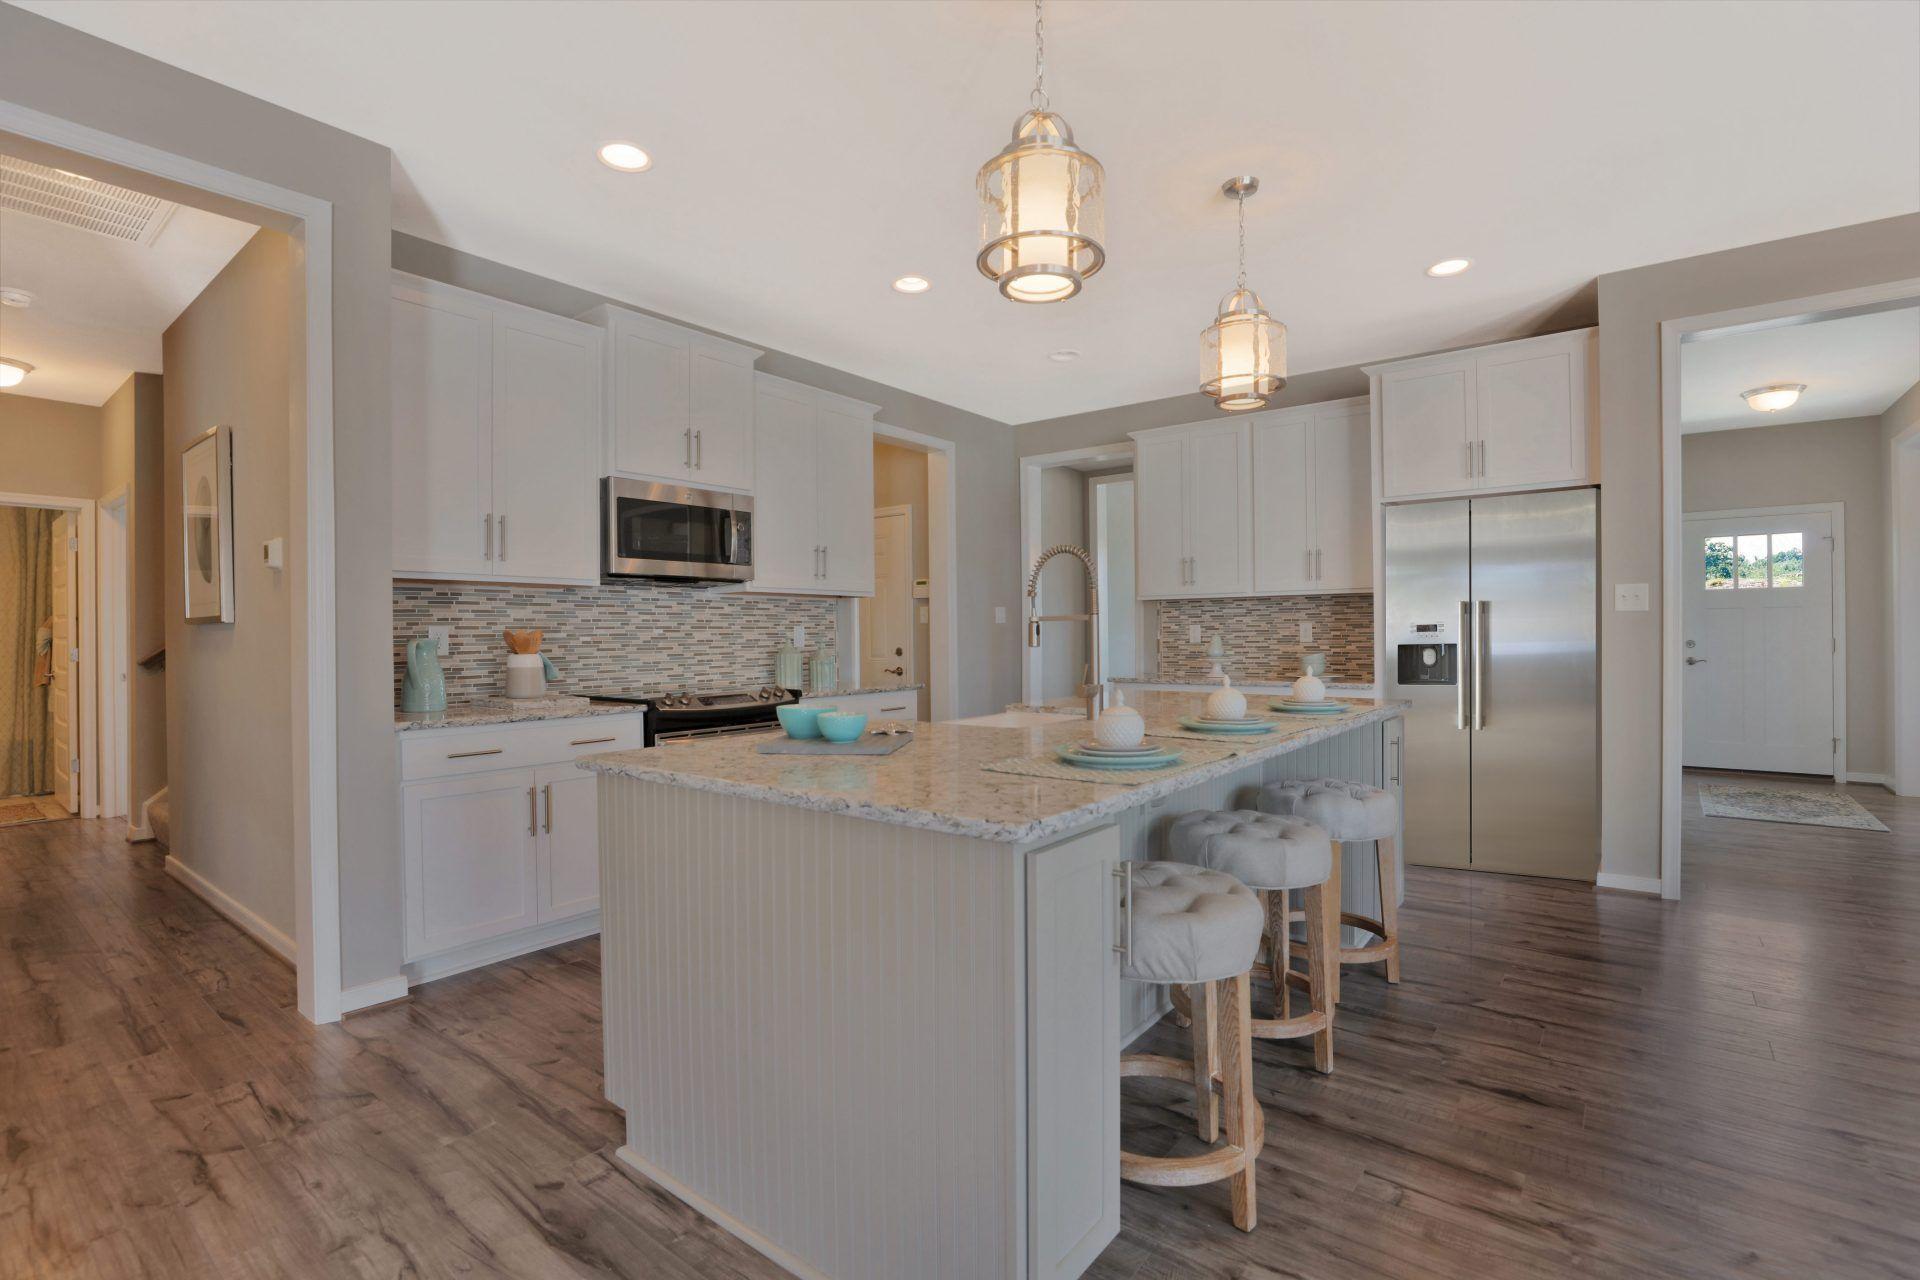 Kitchen featured in the Savannah By HHHunt Homes LLC in Richmond-Petersburg, VA